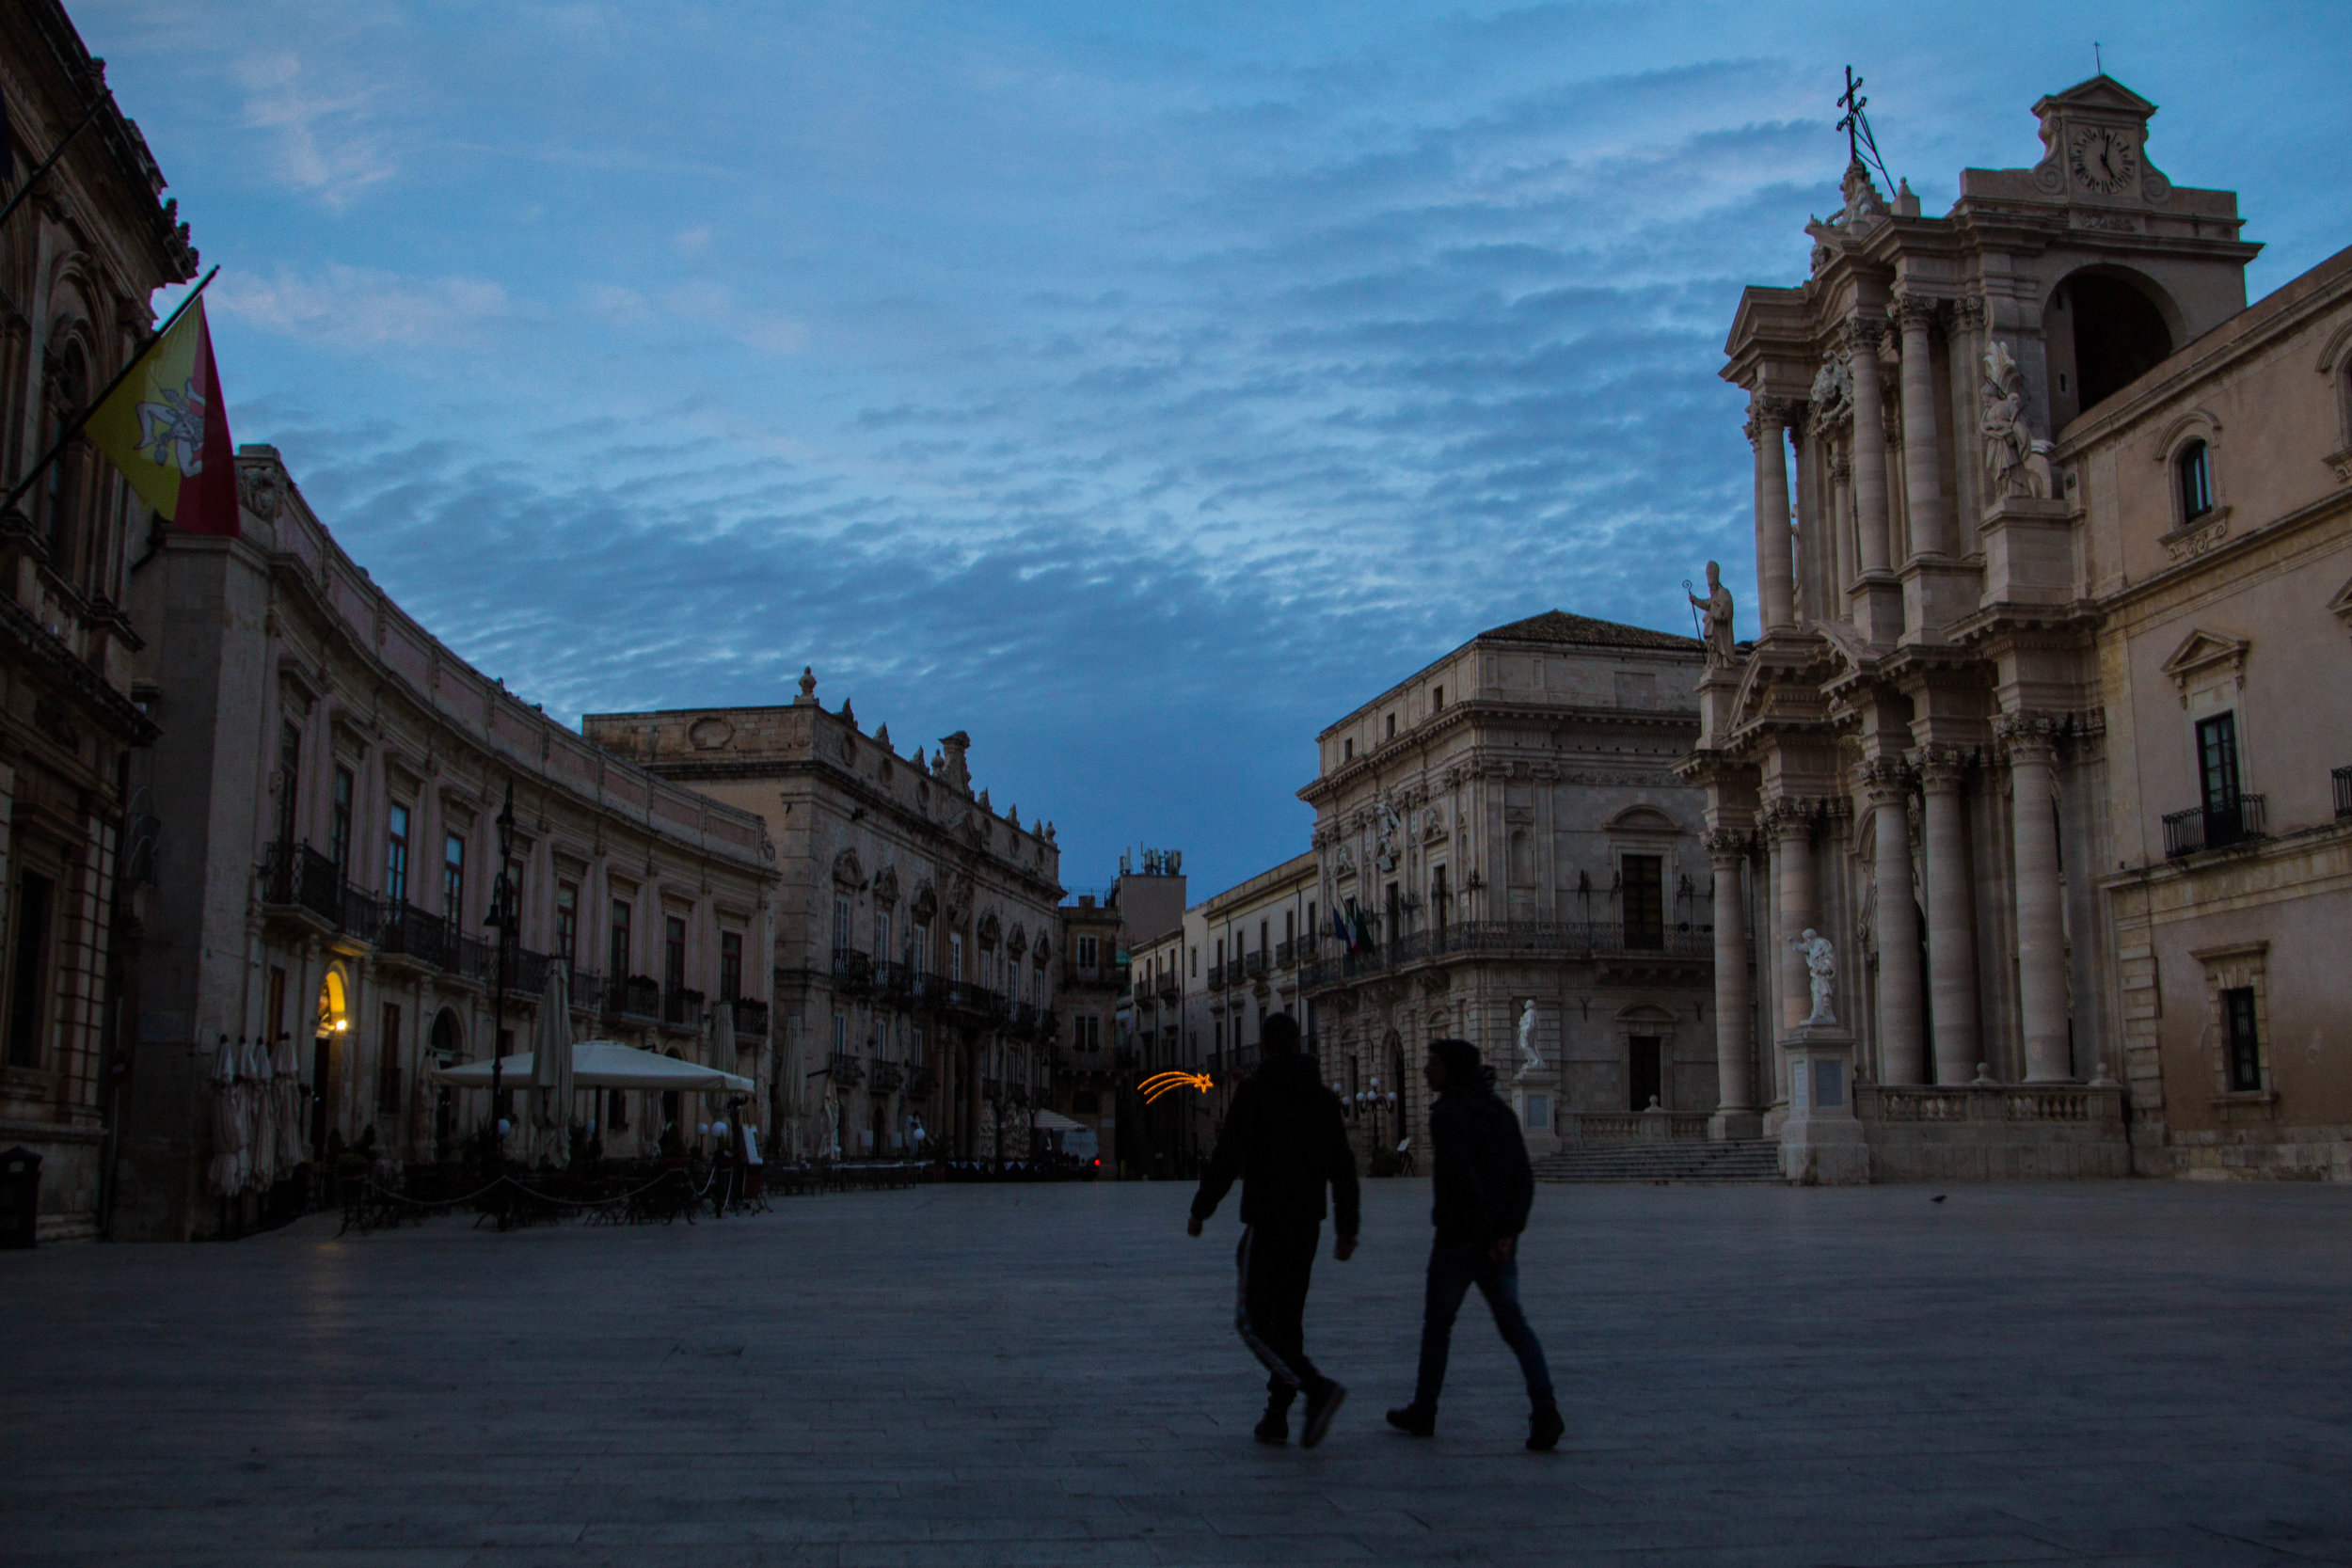 piazza-duomo-sunset-ortygia-syracuse-sicily-11.jpg